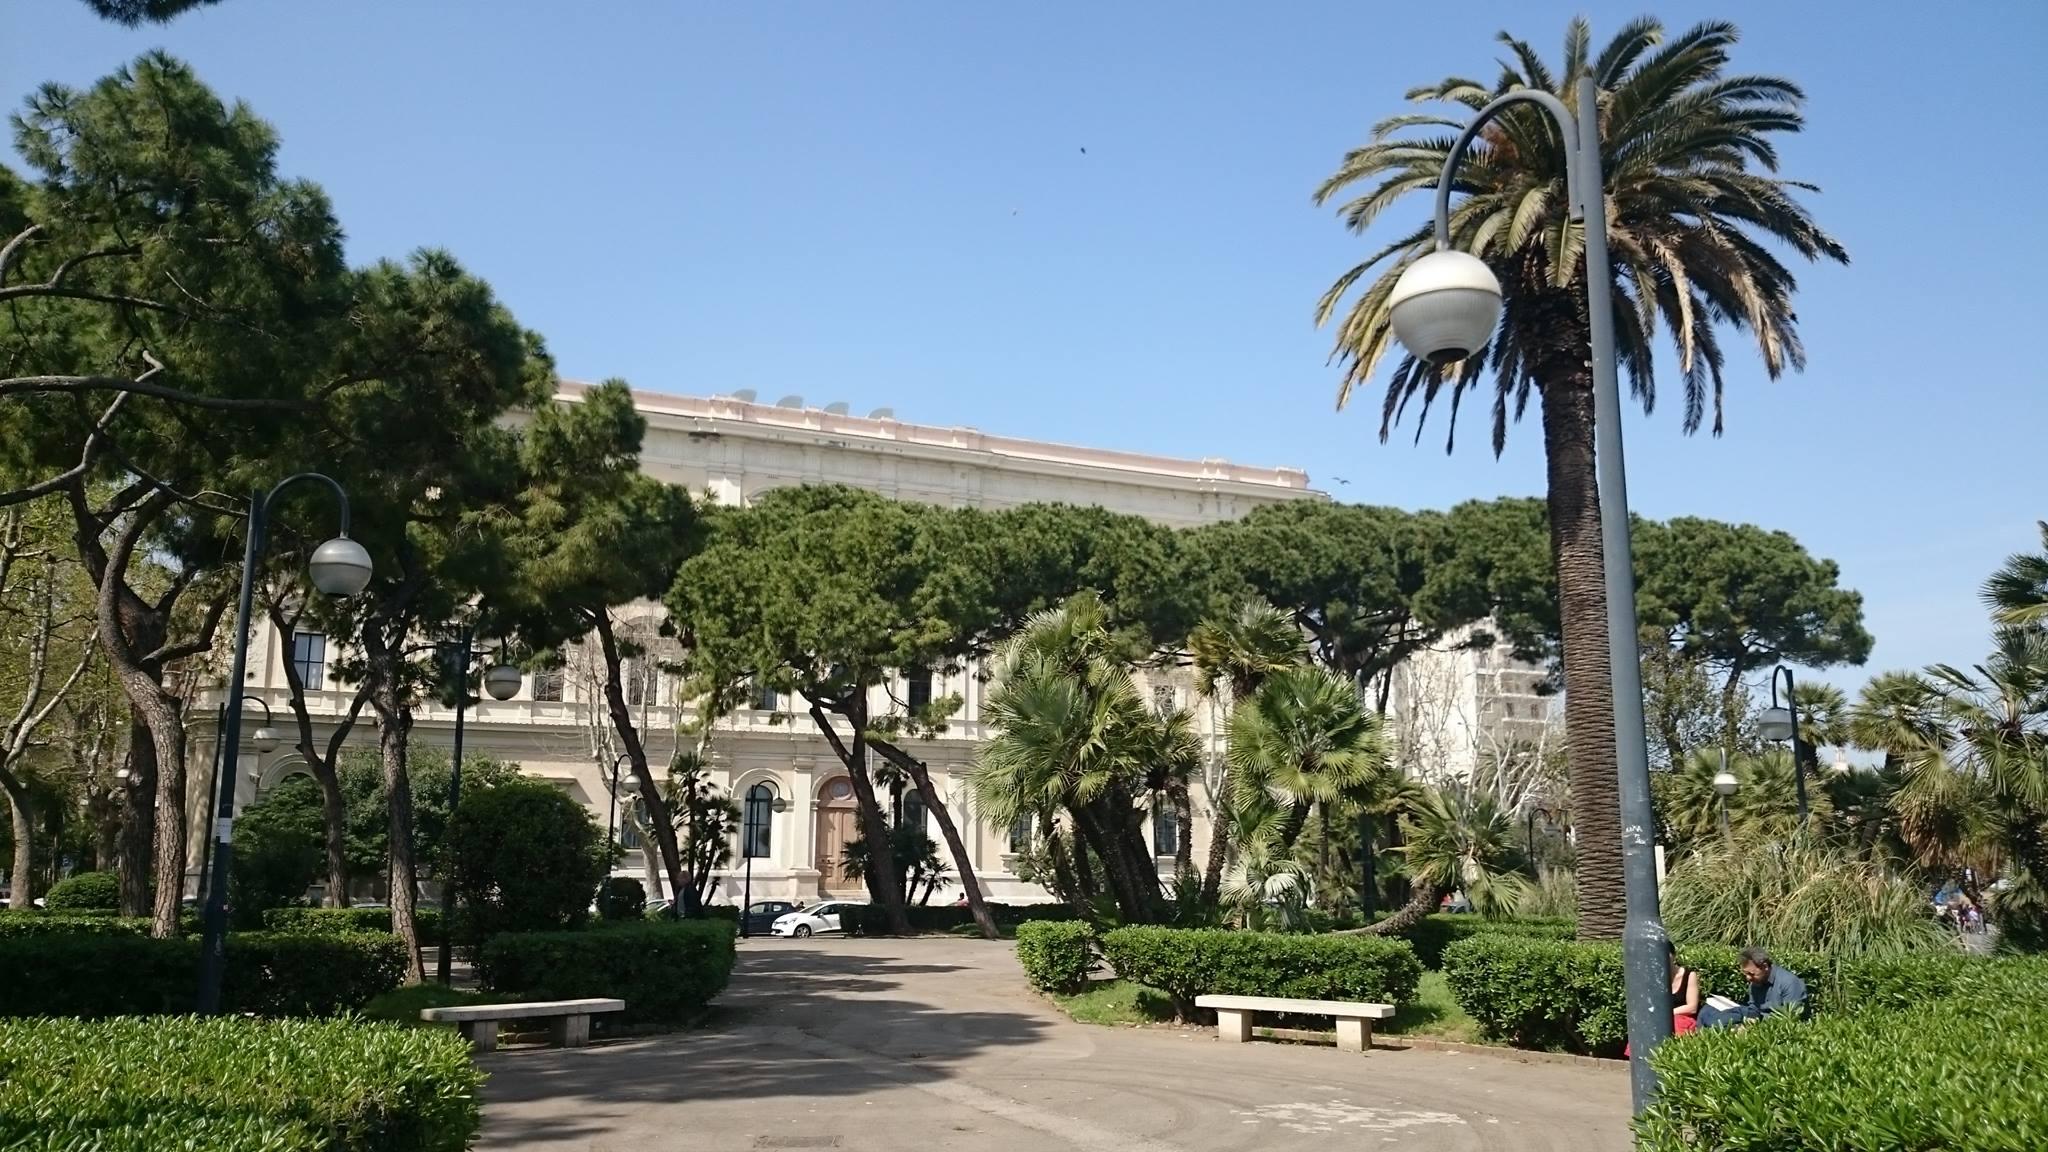 Bari – Geheimtipp in Italien